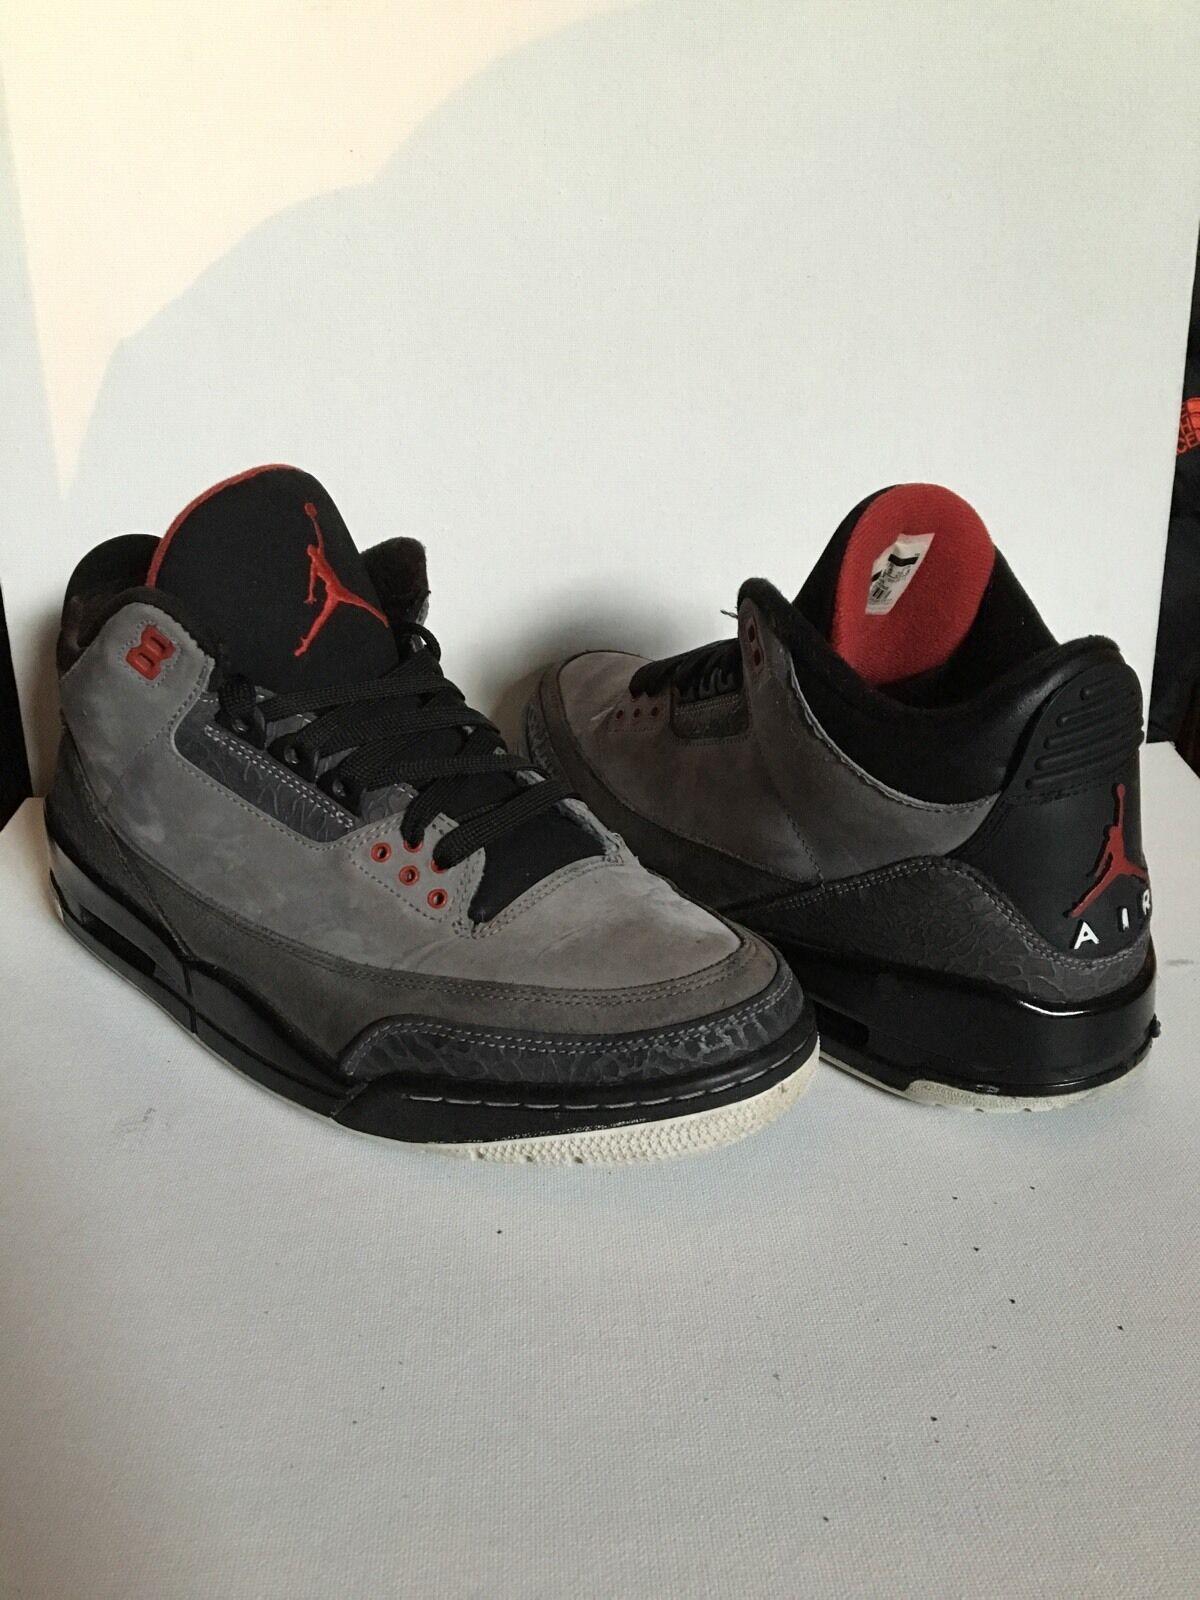 Jordan 3 Retro Stealth Size 10.5 Mens, Cement,True Blue, Bred,